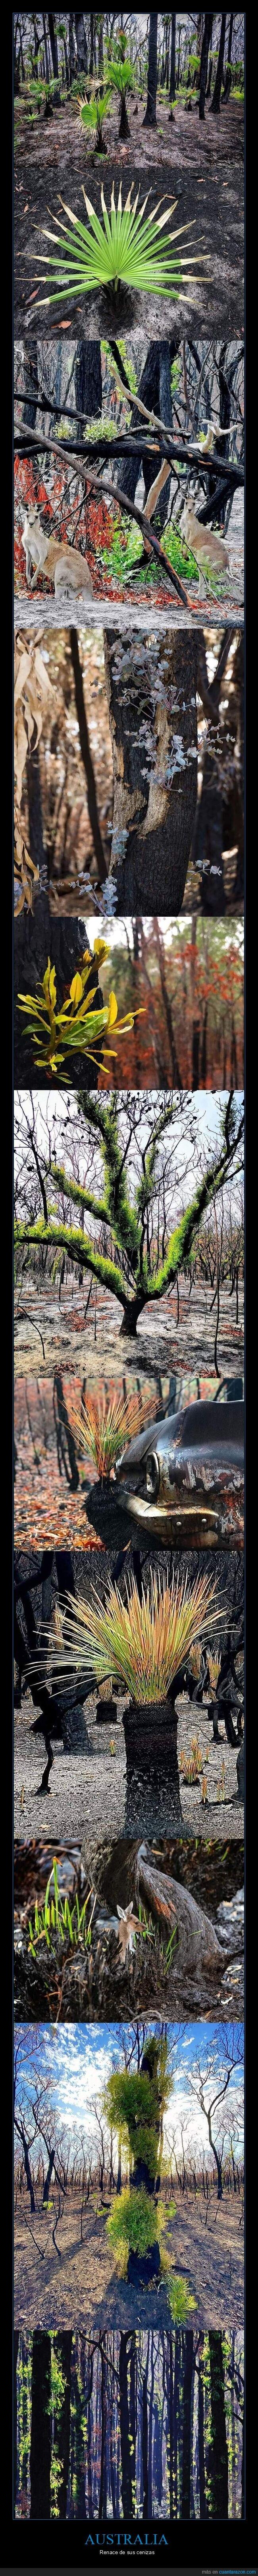 australia,brotes verdes,incendios,naturaleza